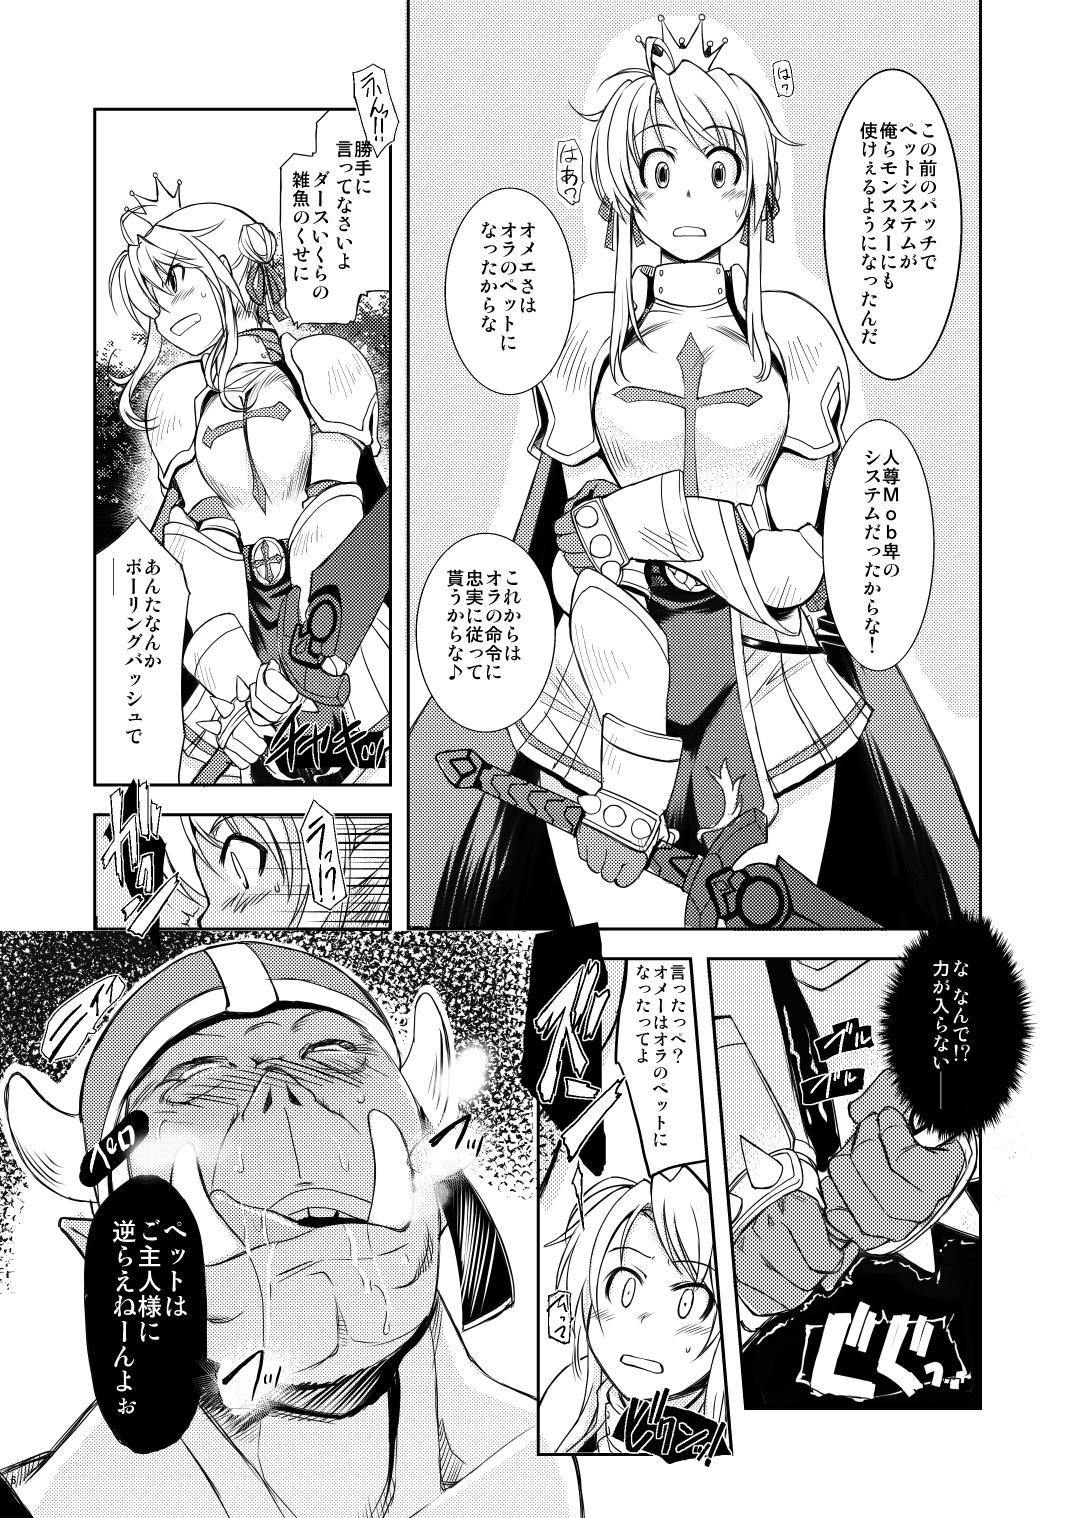 Hime Kishi Tame 1 4